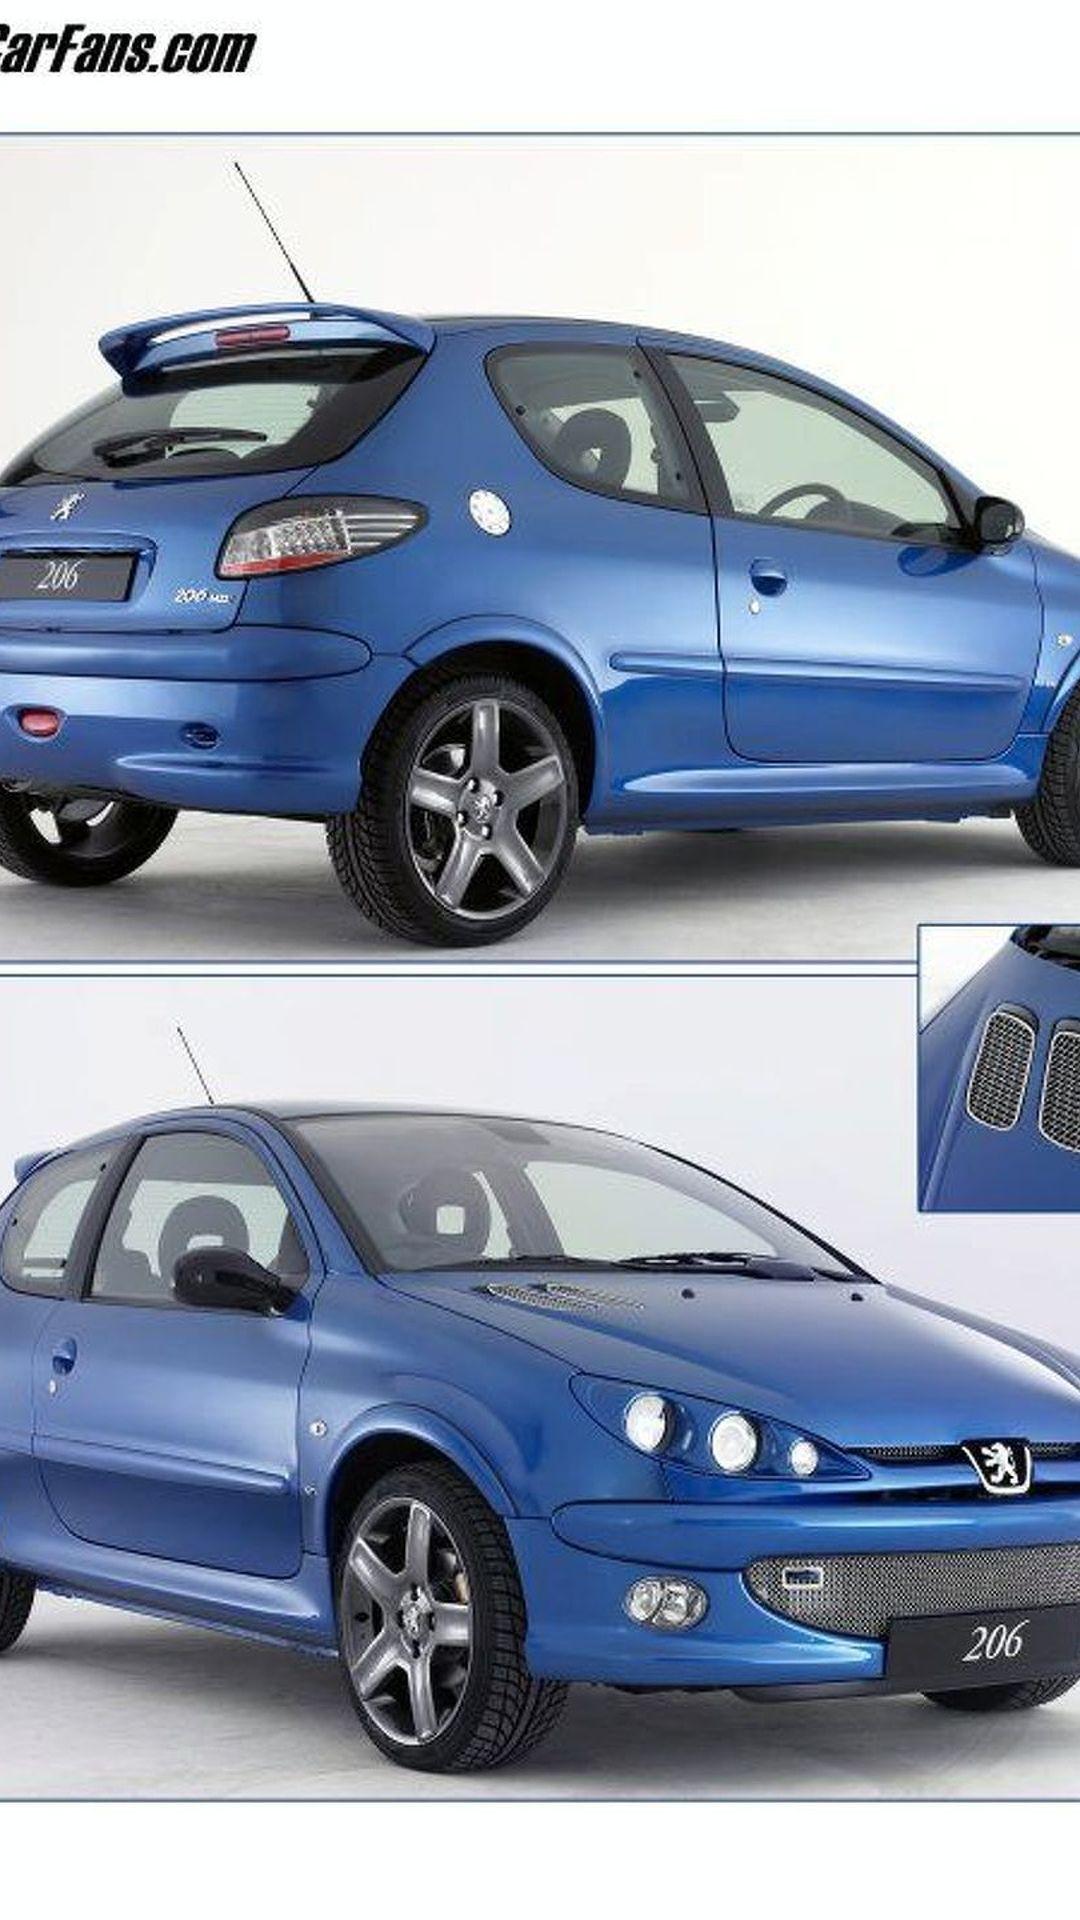 Peugeot 206 Sport Accessories Uk Motor1 Com Photos